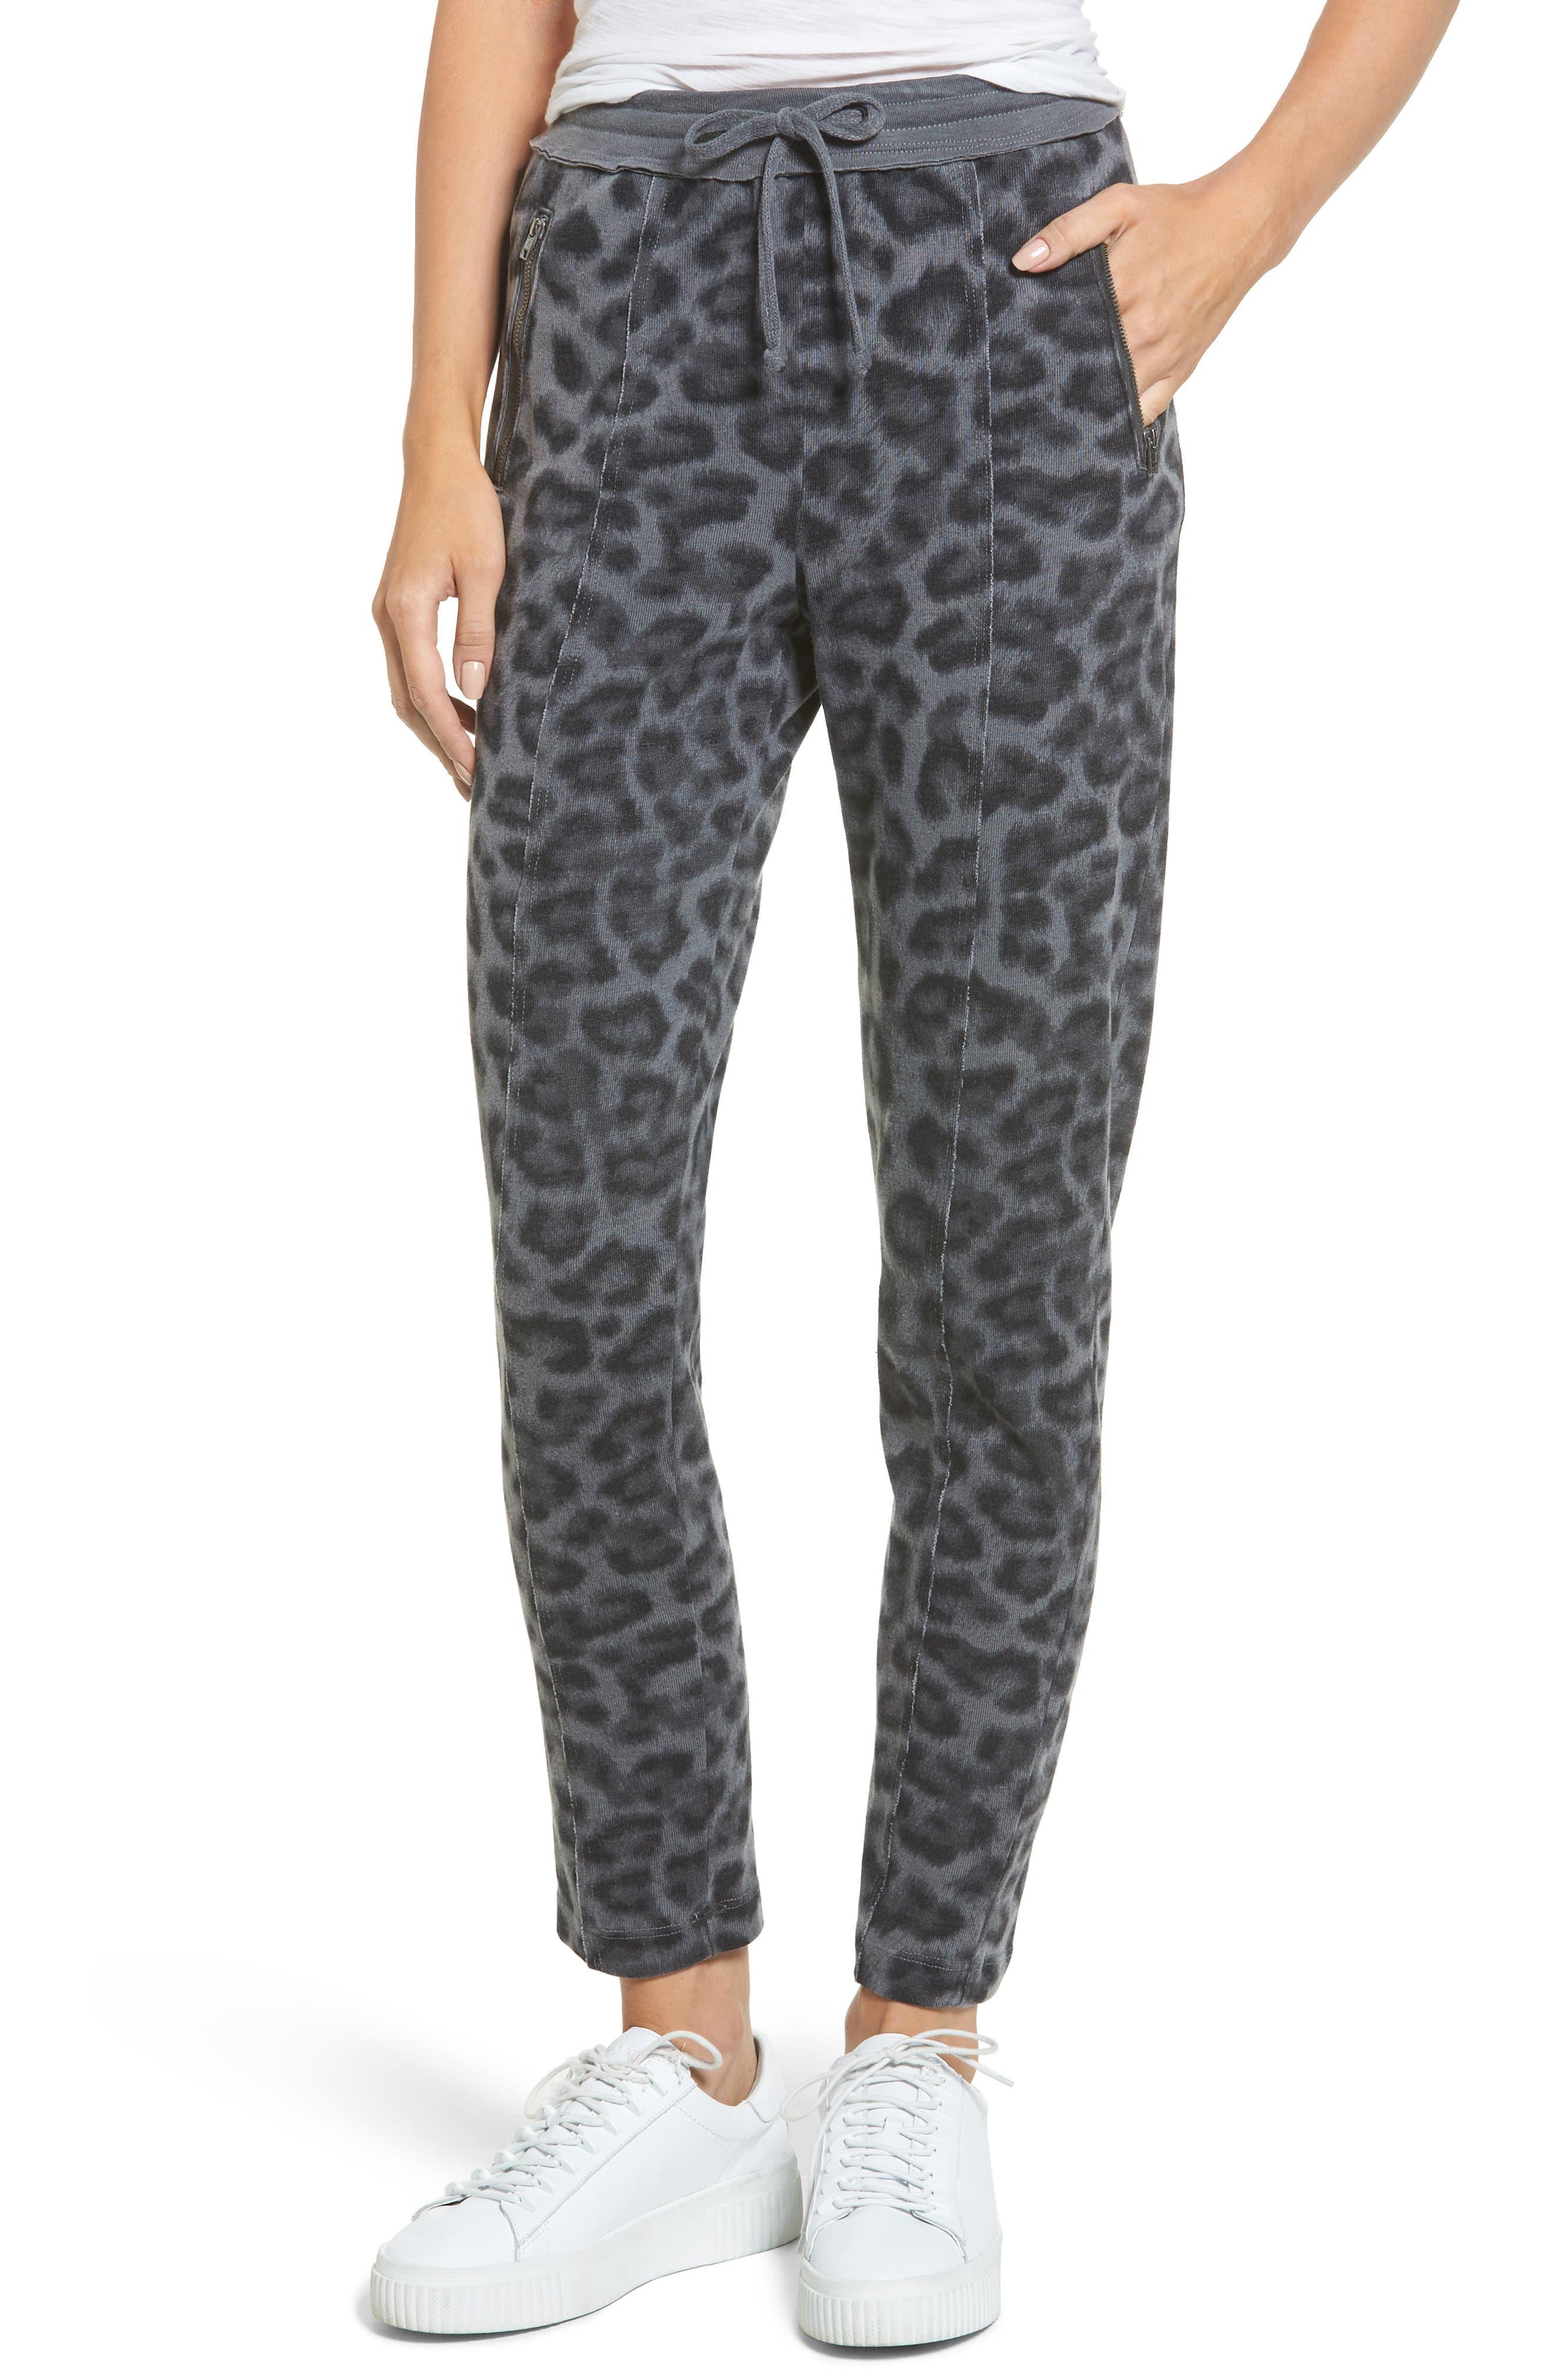 Leopard Print Jogger Pants,                             Main thumbnail 1, color,                             Lead